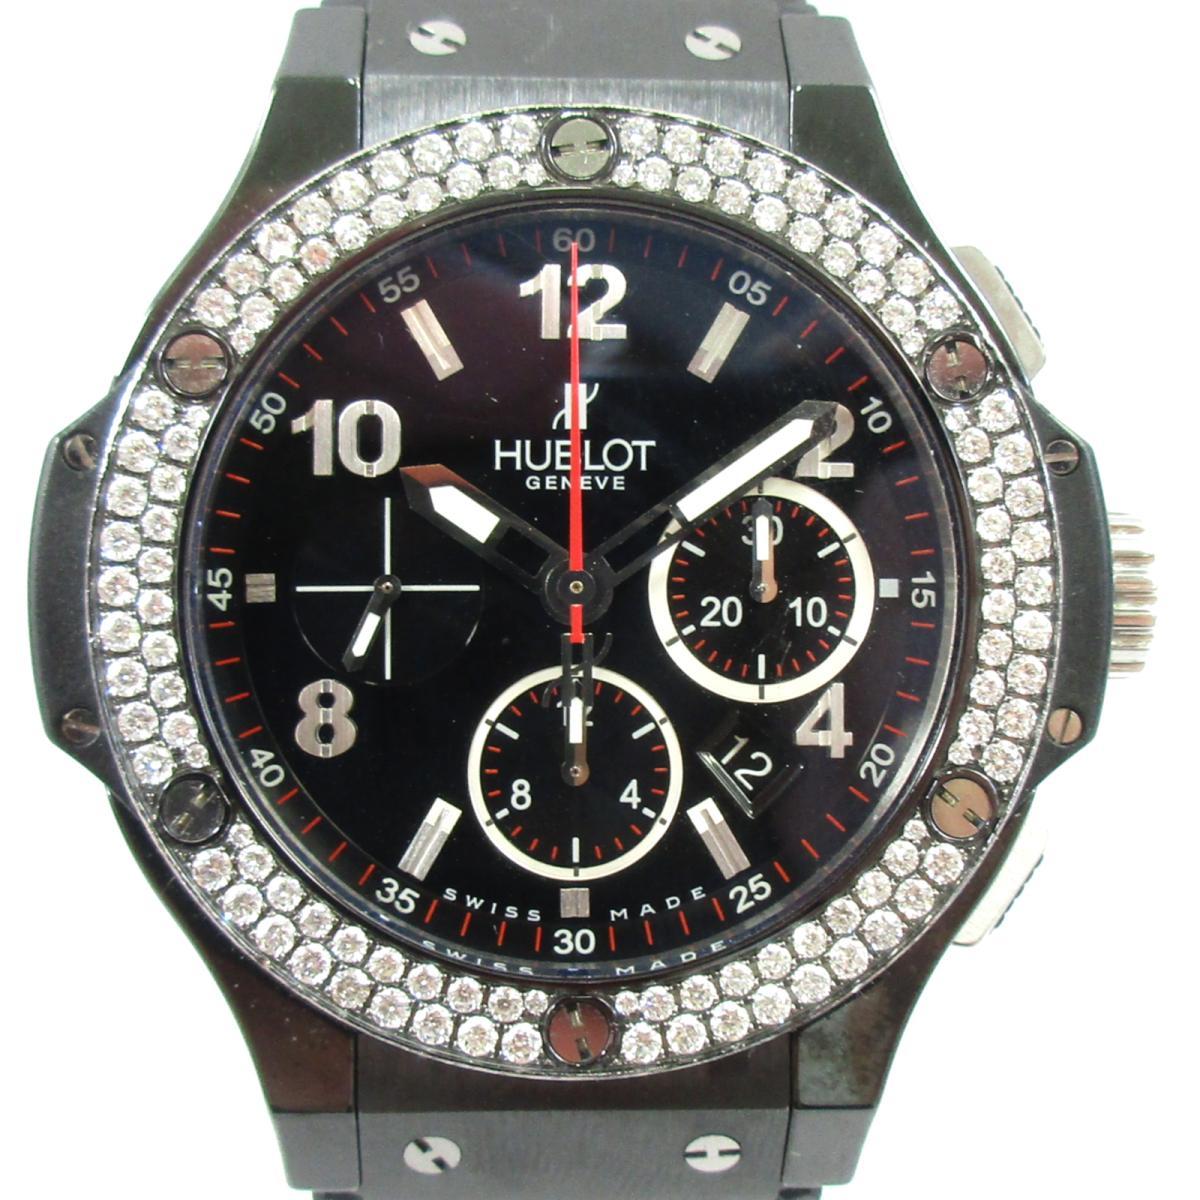 【25%OFF】 ウブロ ビッグバン ブラックマジック 裏スケルトン 腕時計 時計 メンズ ステンレススチール (SS) XラバーベルトXダイヤモンド ブラック (301.CV.130.RX.11) 【】 | HUBLOT BRANDOFF ブランドオフ ブランド ブランド時計 ウォッチ, ワジキチョウ 06da582d